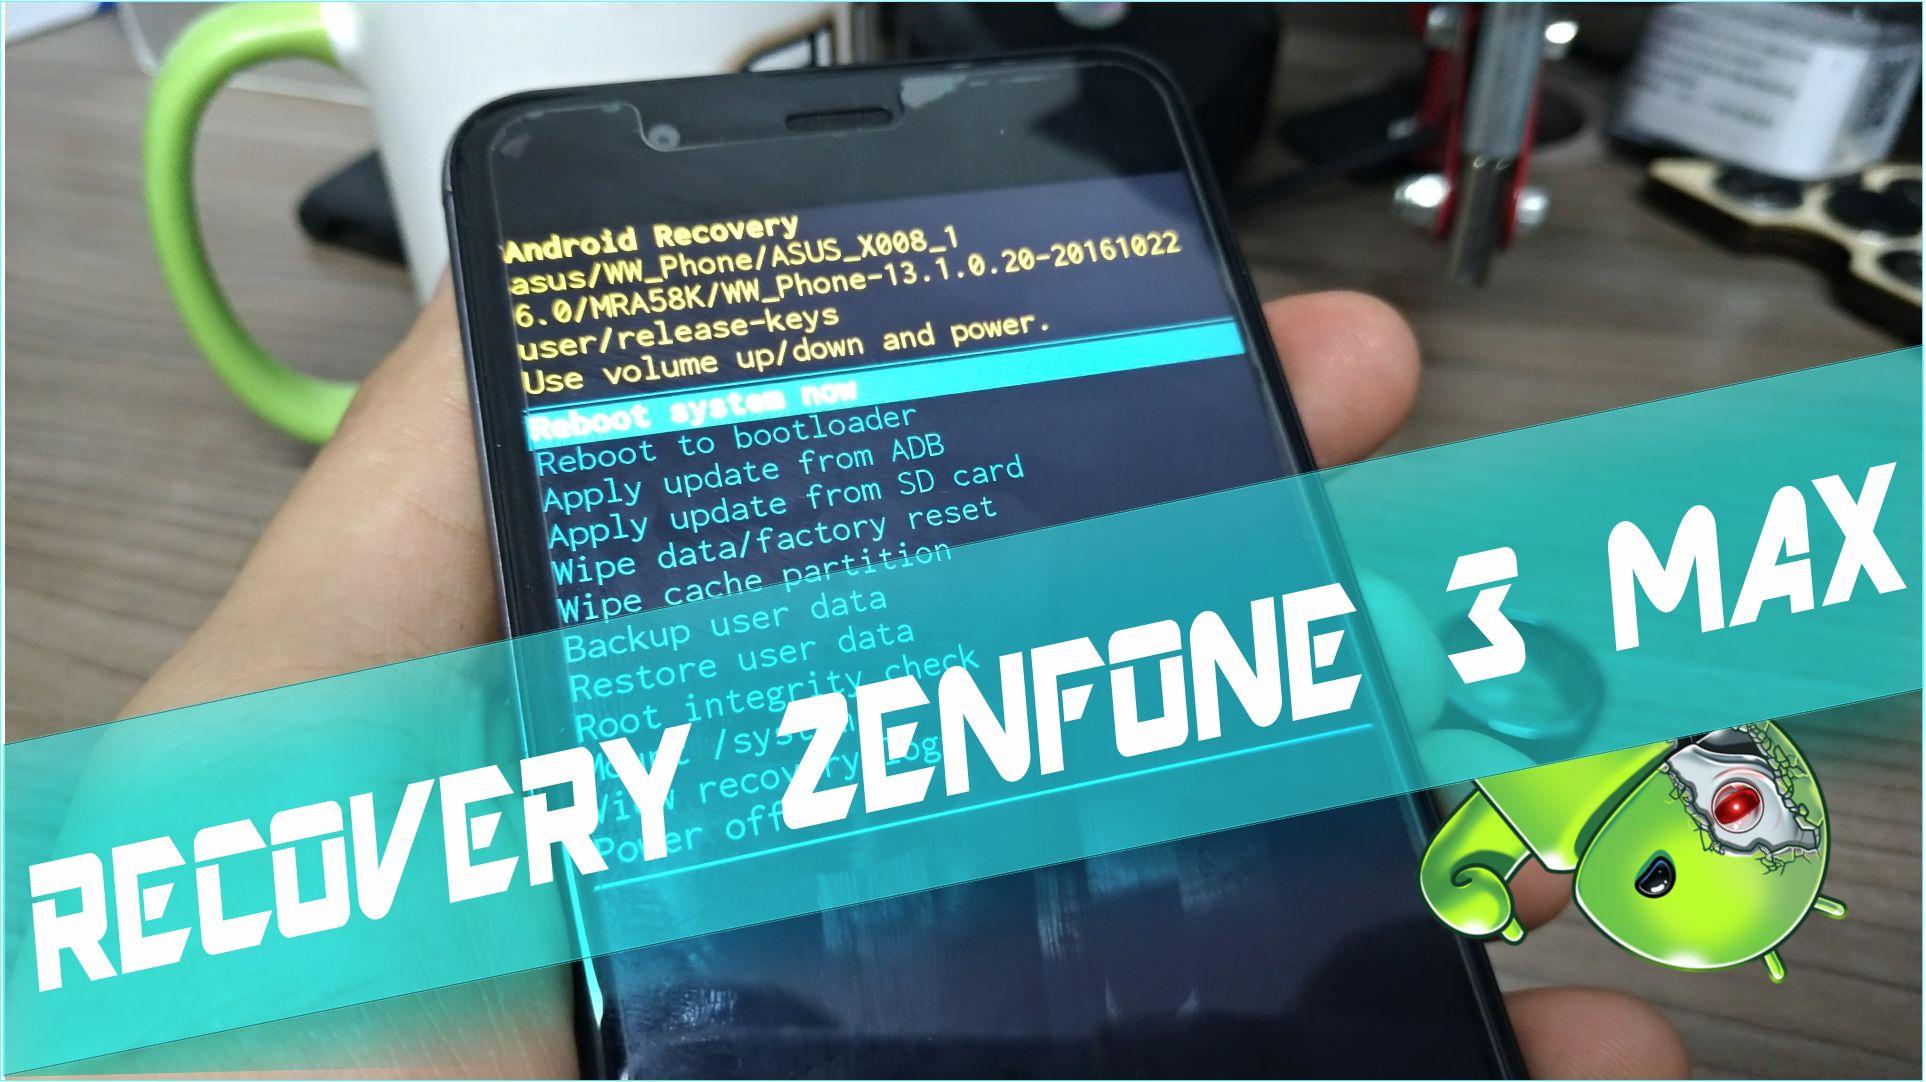 Como acessar o Modo Recovery do Zenfone 3 MAX ZC520TL